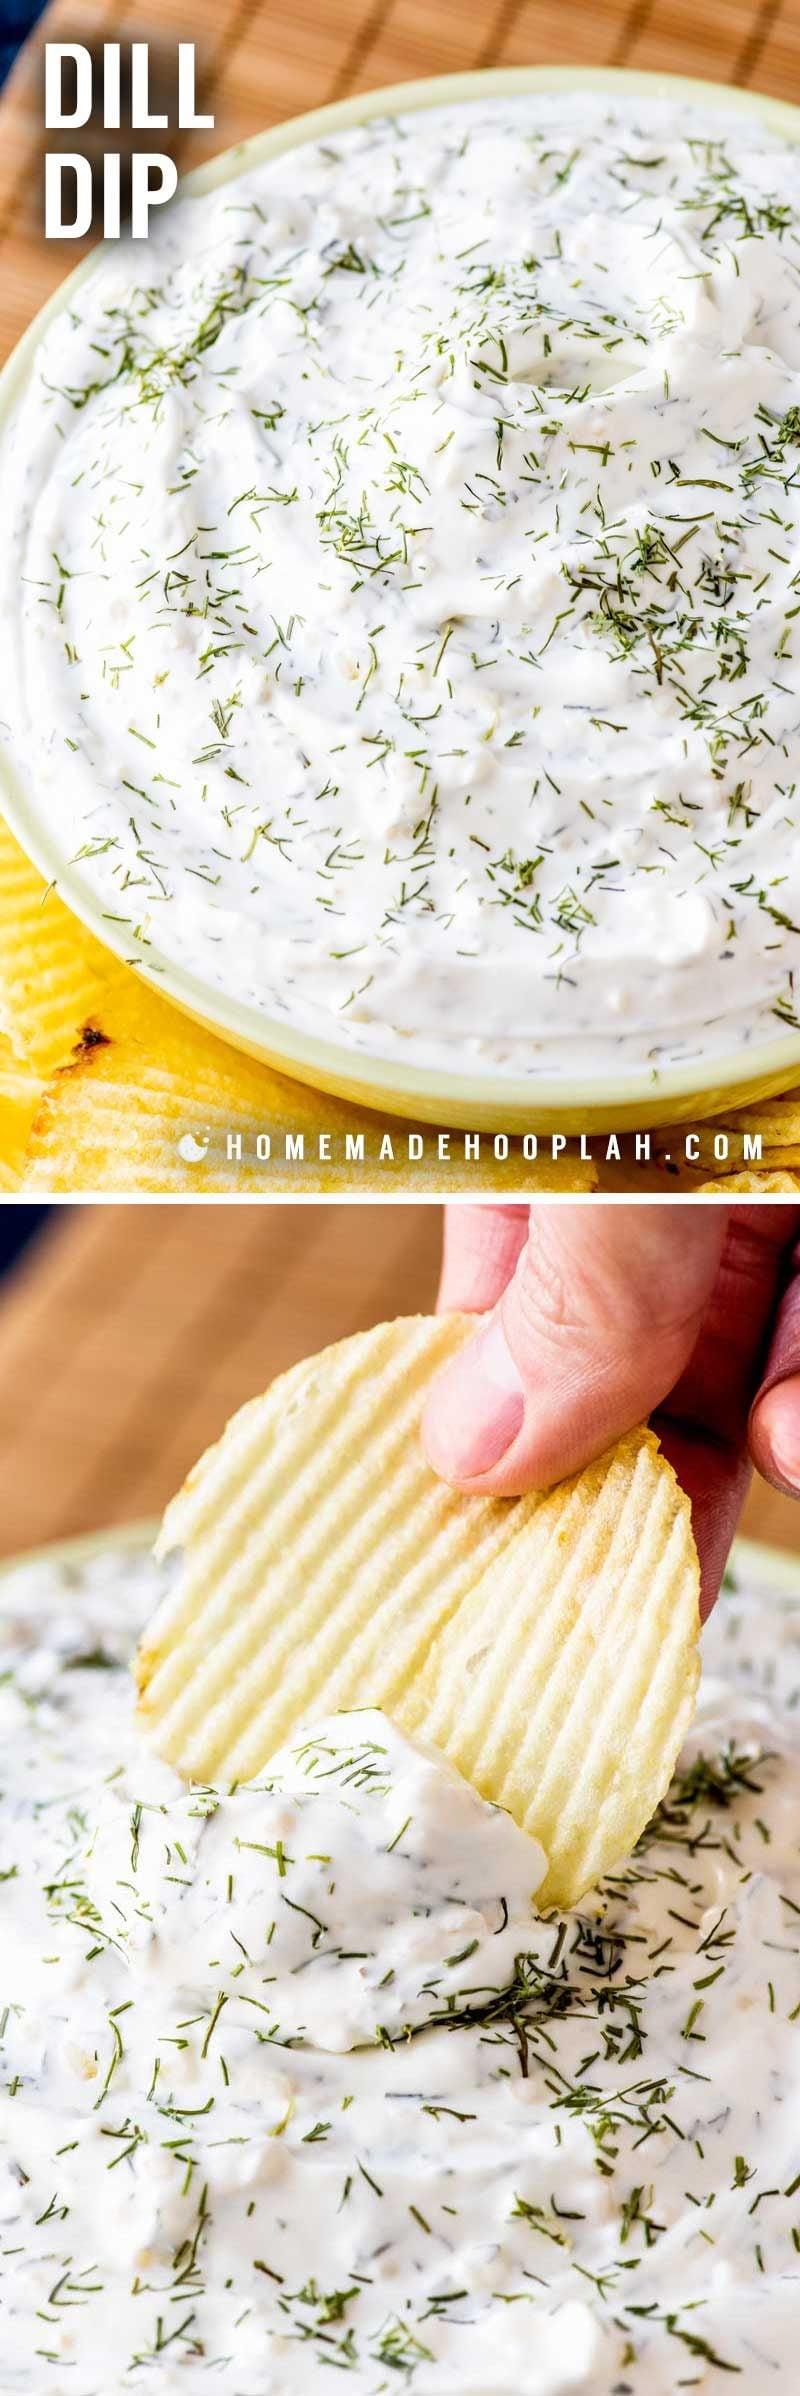 Dill dip recipe for dipping veggies.